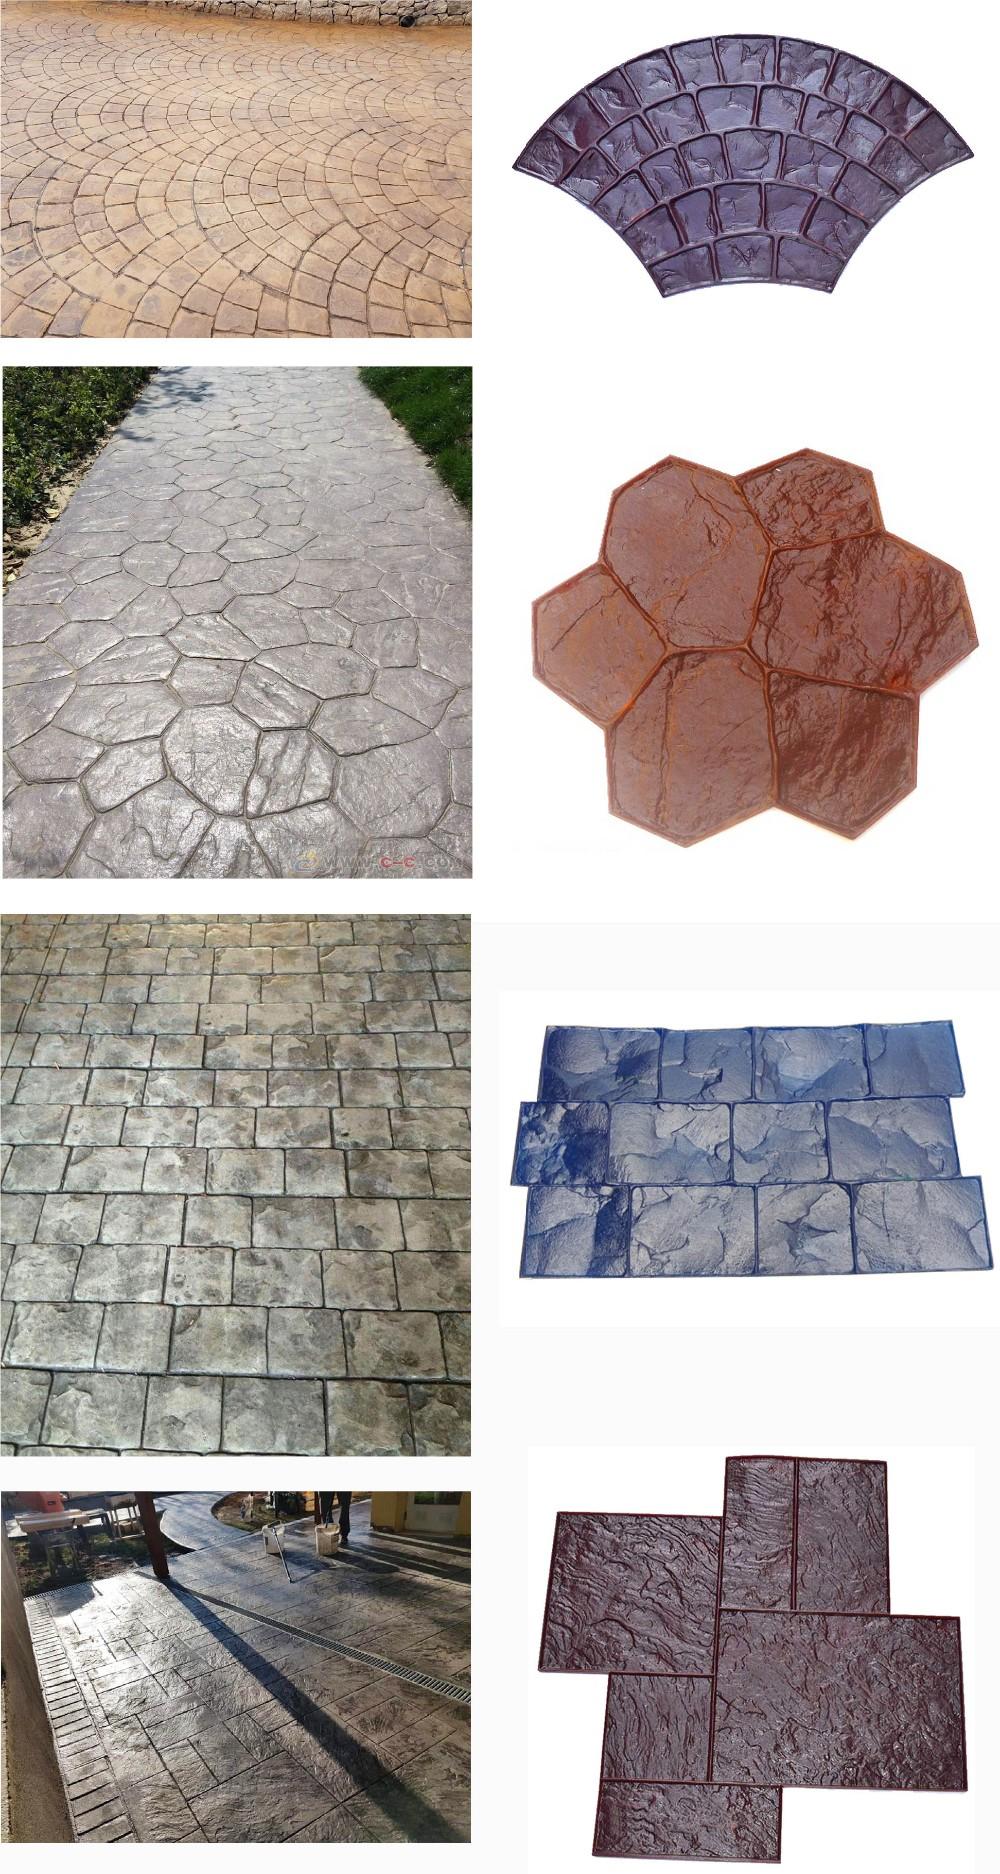 Piedra Huella Textura Decorativo De Hormigón Cemento Sello Mat Silicona Estampado